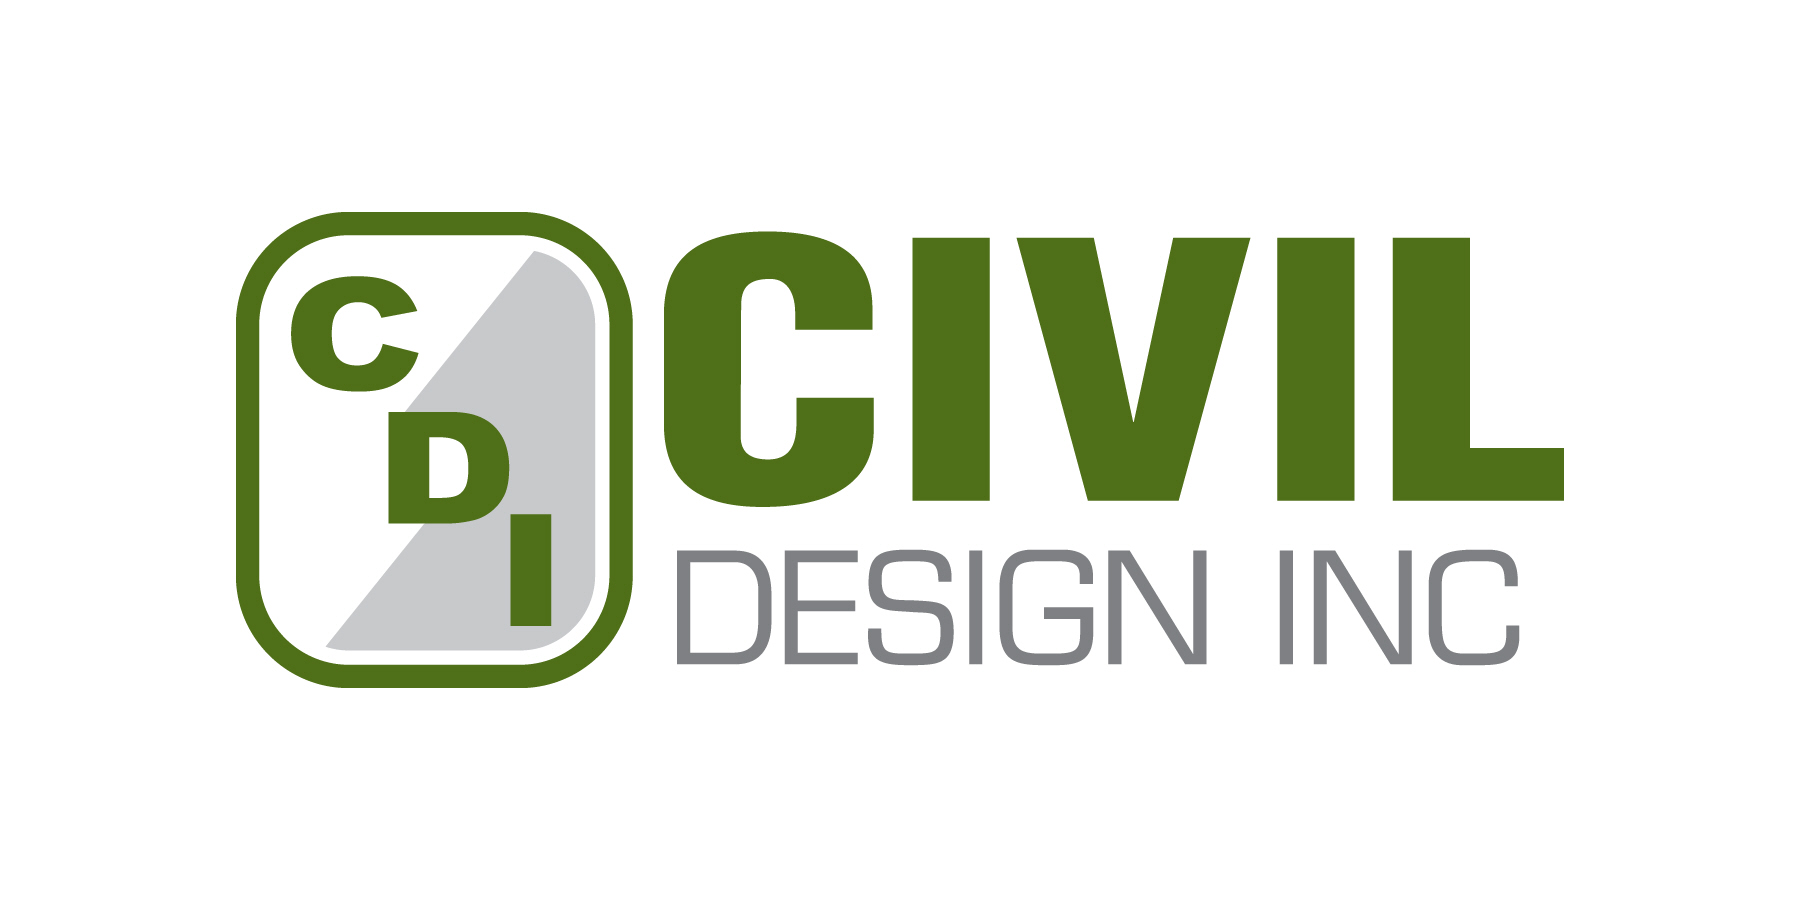 Civil-Design.jpg